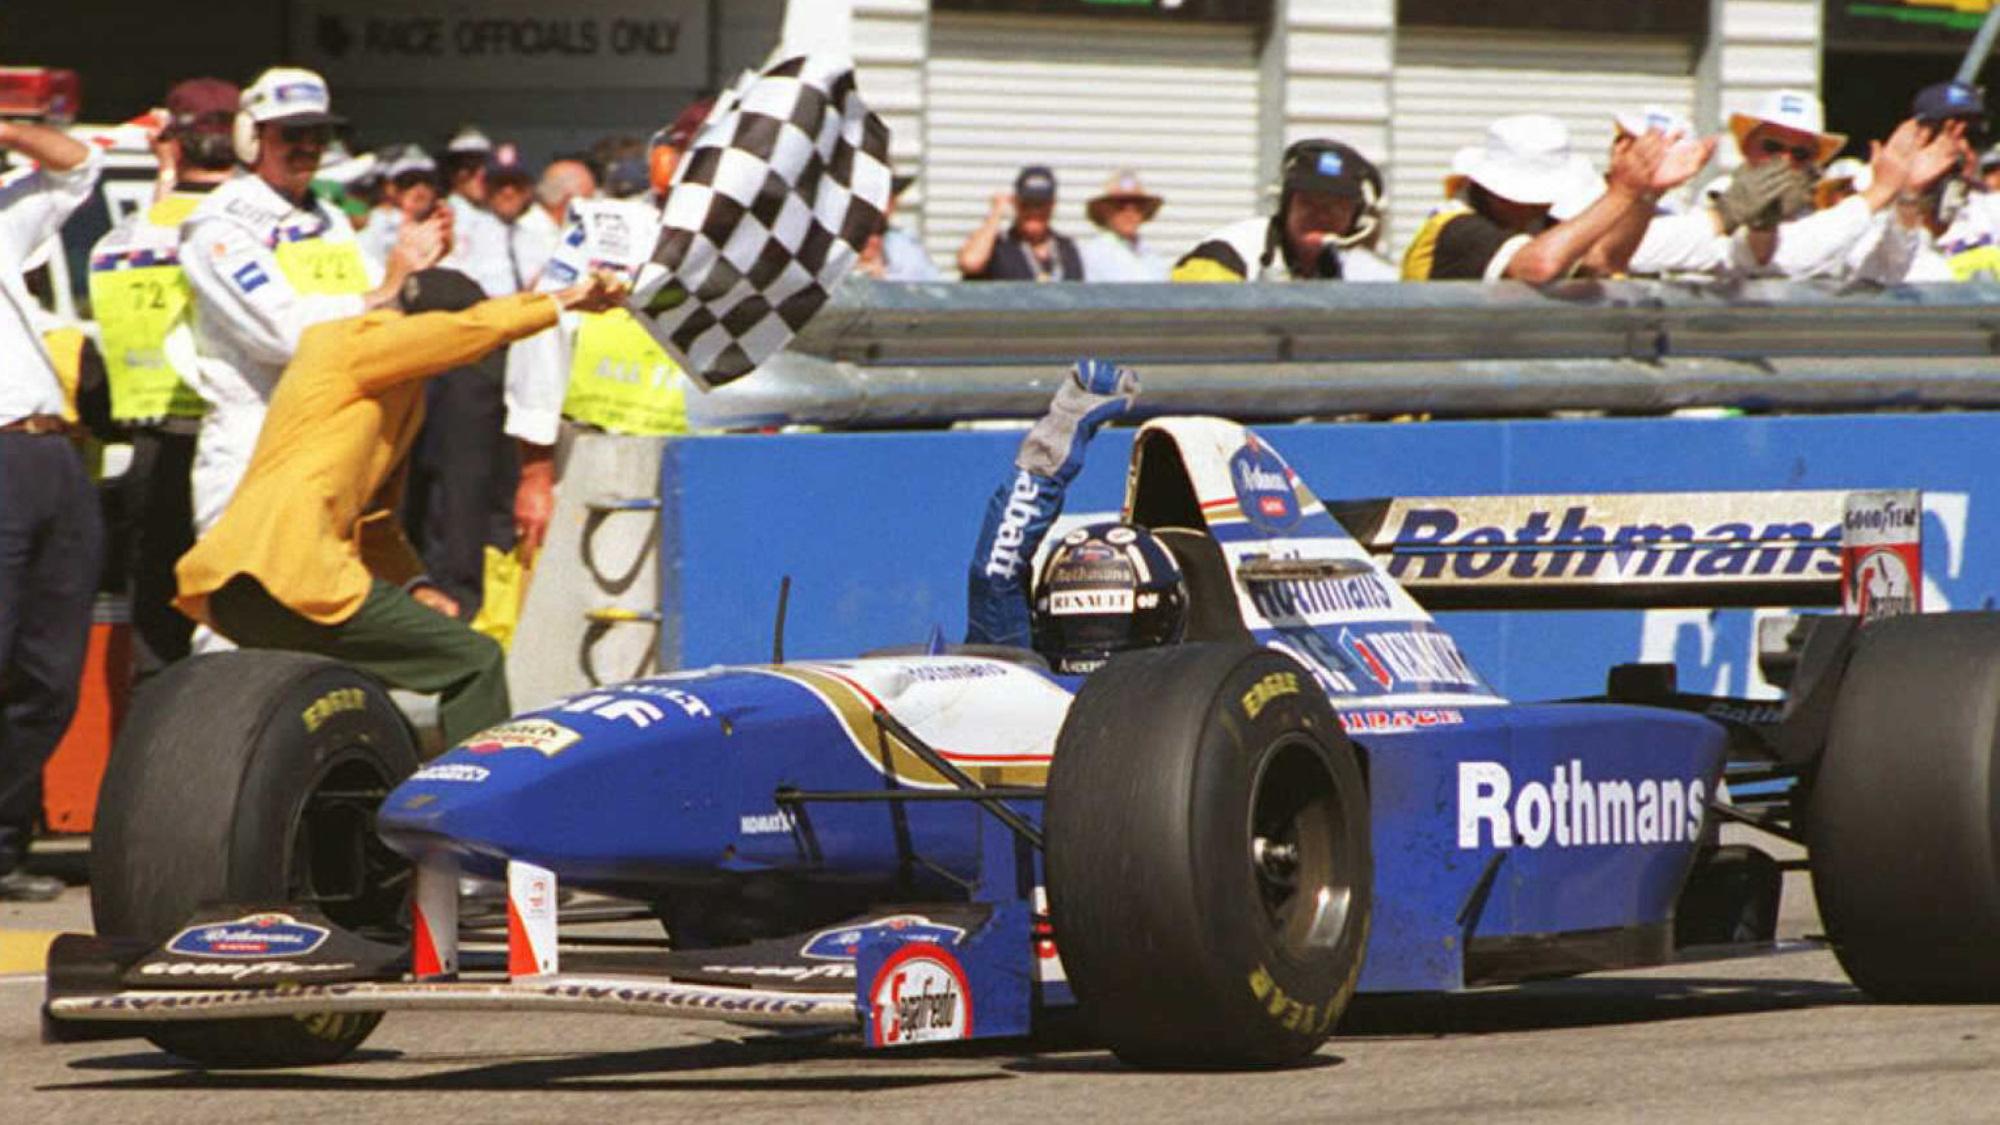 Damon Hill, 1995 Australian GP